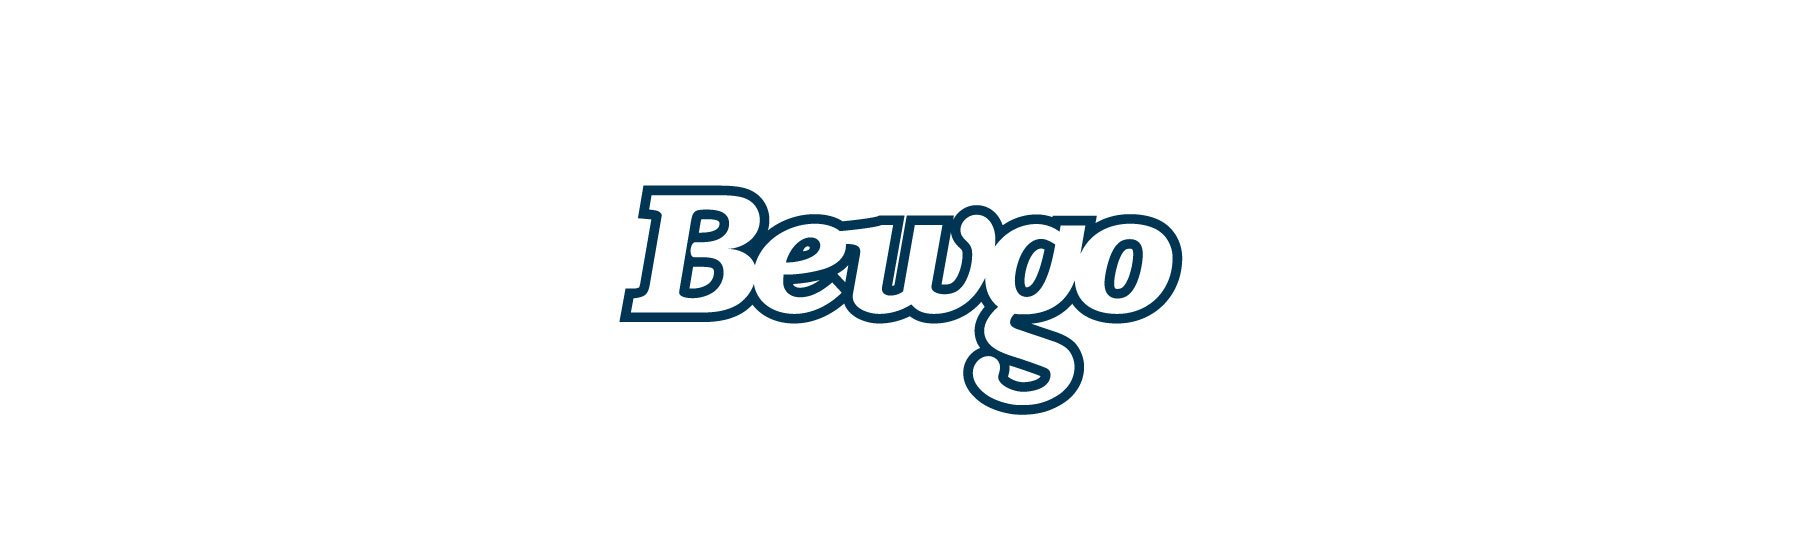 国外品牌视觉识别设计(Logo标志、名片、iCon图标、UI用户界面)案例 – Bewgo | Travel with emotion